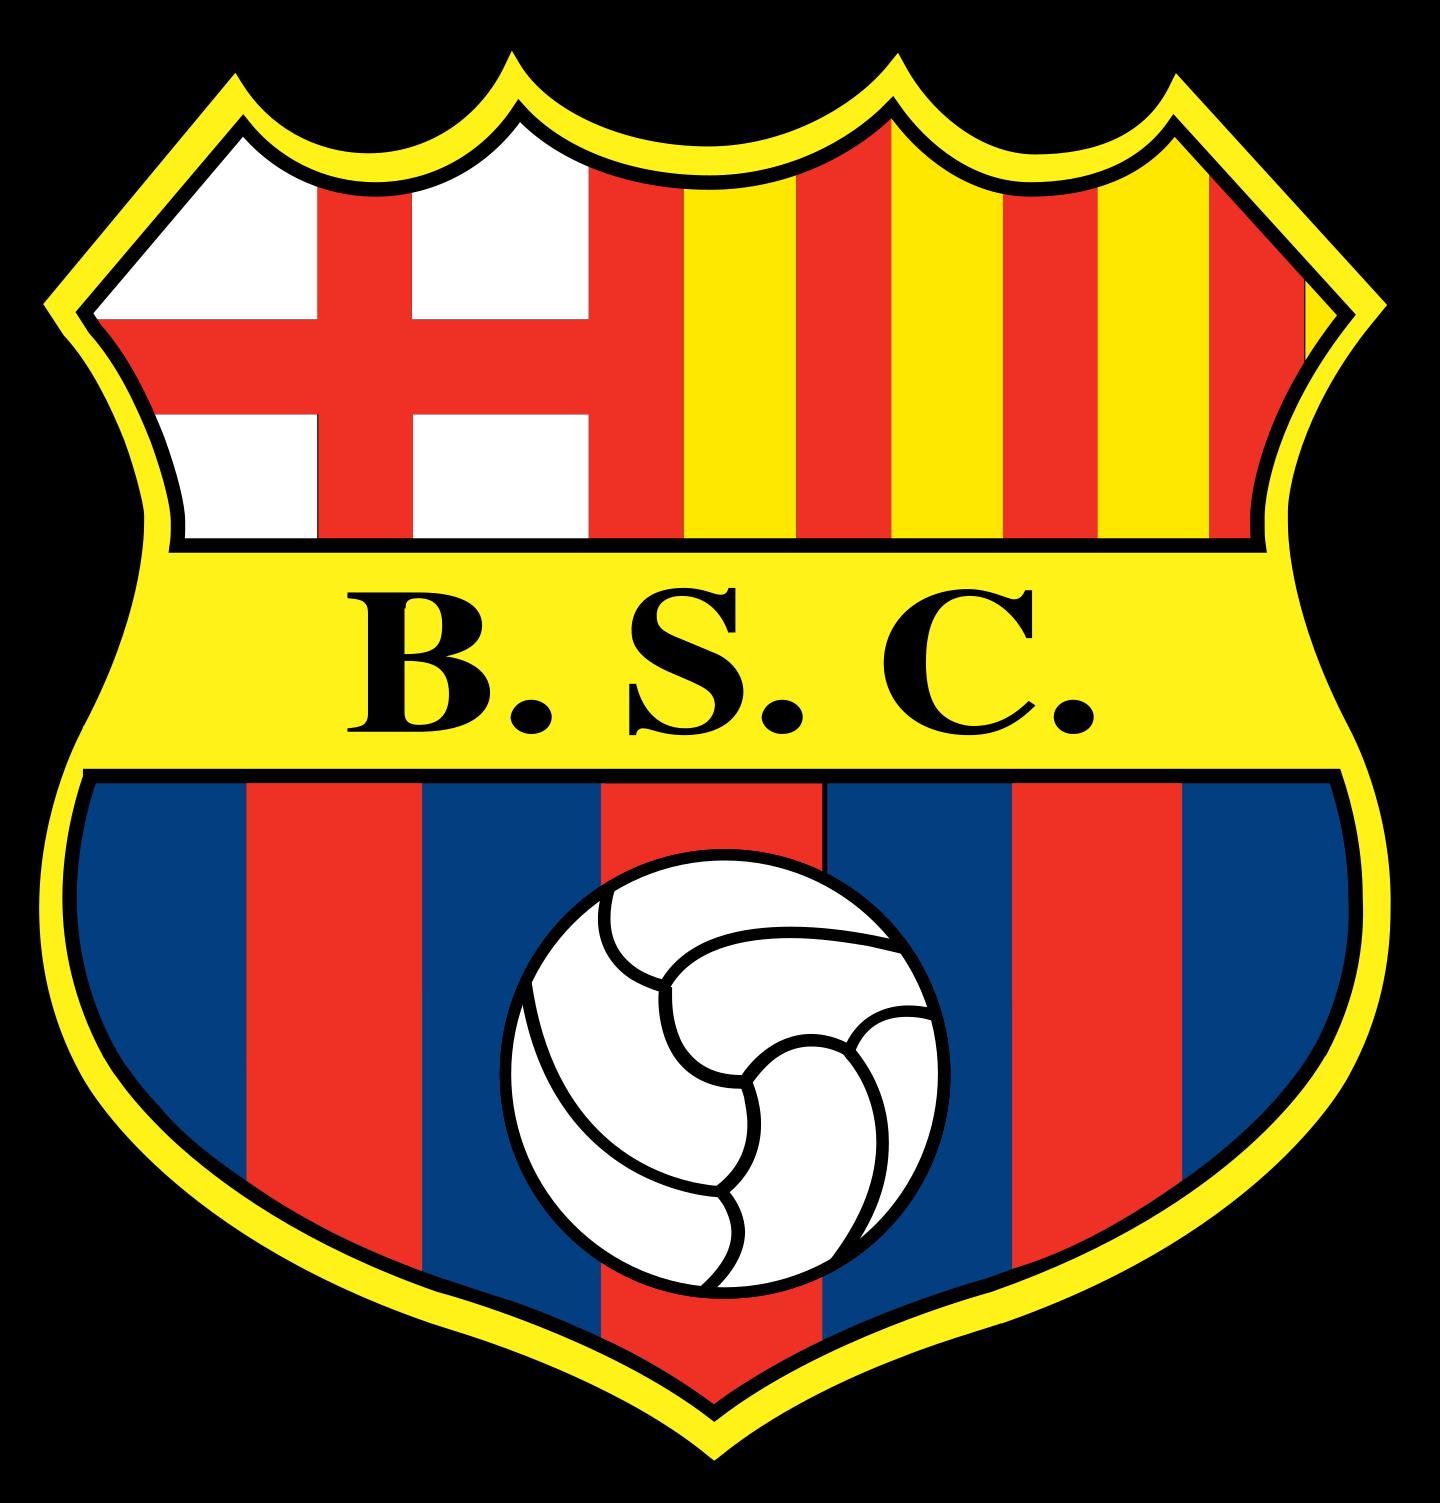 barcelona sc logo 7 - Barcelona SC Guayaquil Logo